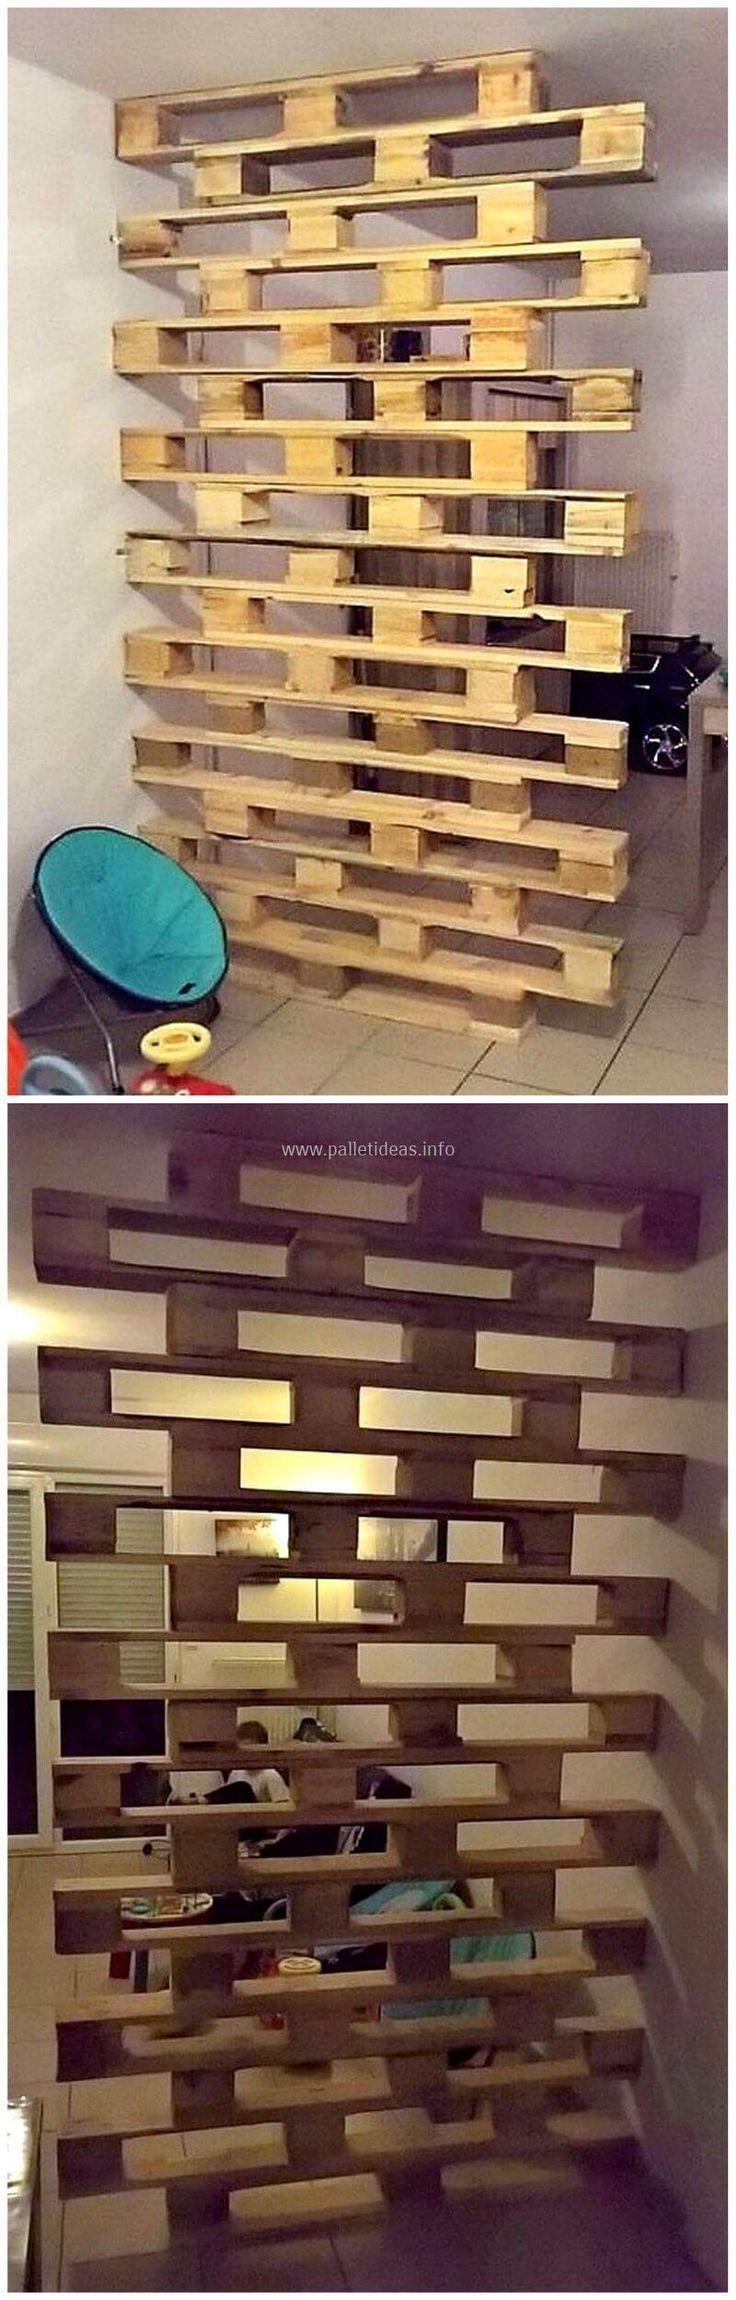 ideas classy hom enterwood flooring gray vinyl. What Is Hot On Pinterest: Black Floor Lamps Ideas Classy Hom Enterwood Flooring Gray Vinyl